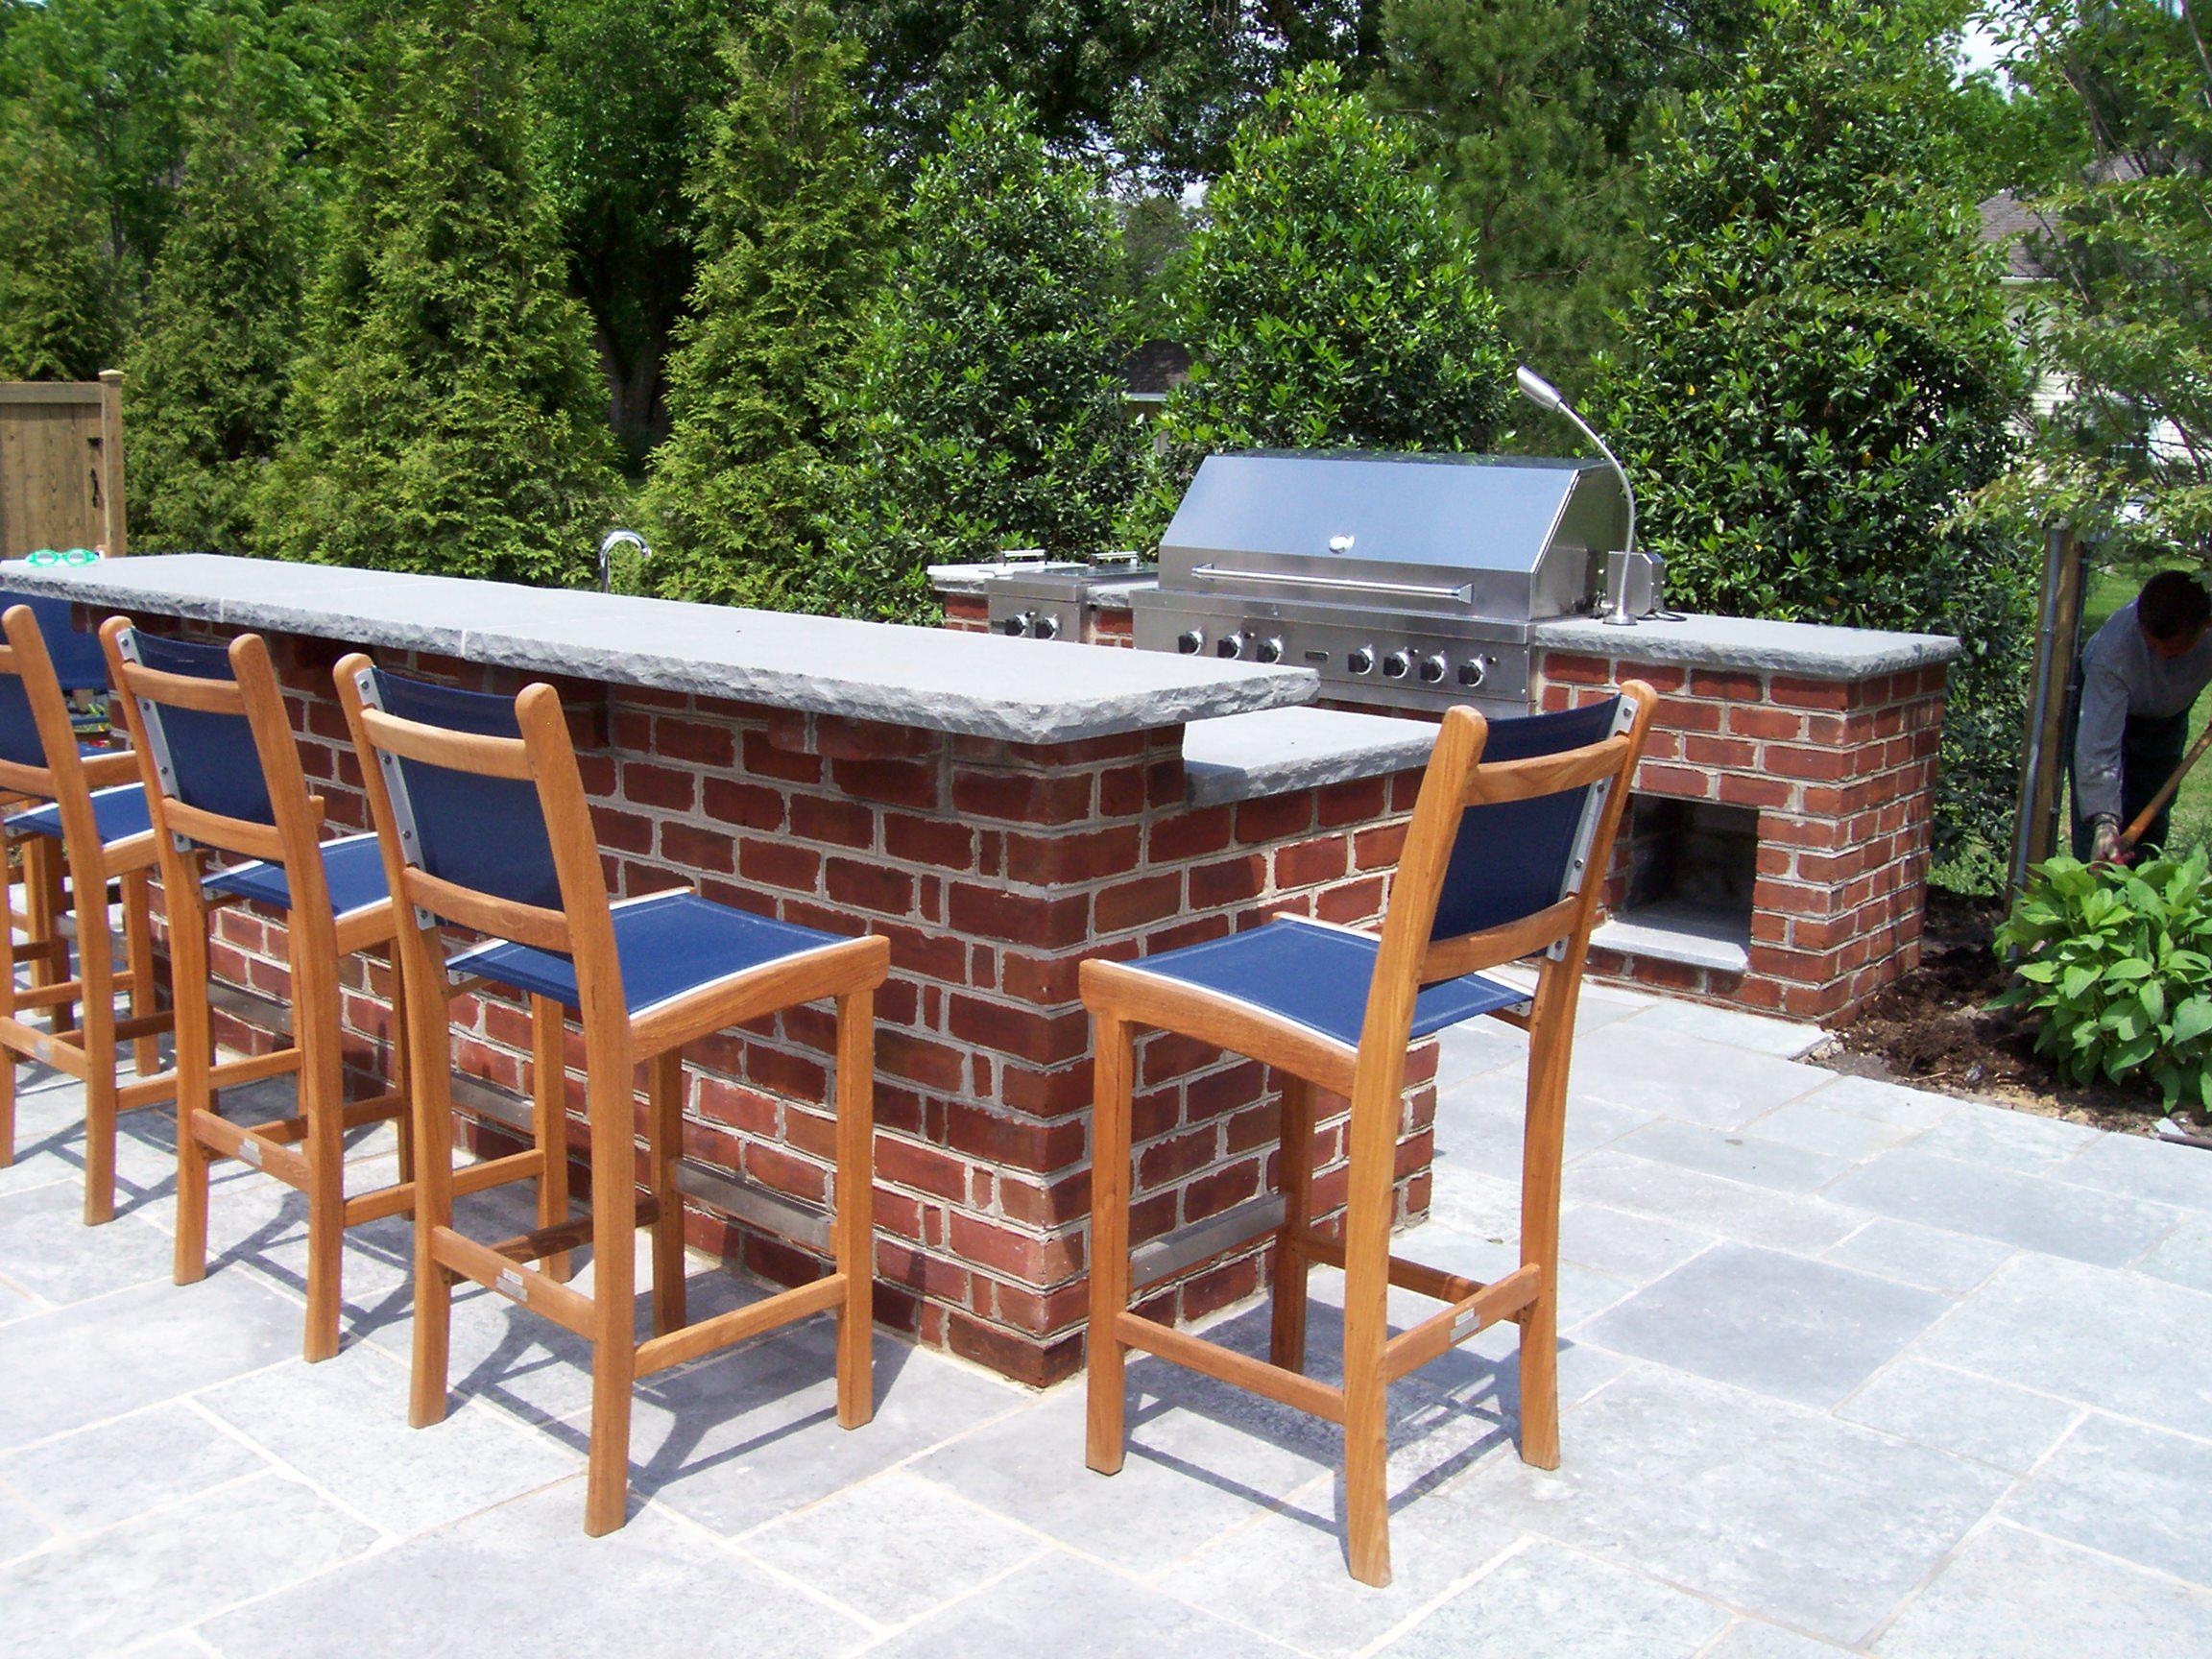 Colao & Peter   Luxury Outdoor Living   Custom Pools ... on Colao & Peter Luxury Outdoor Living id=77476